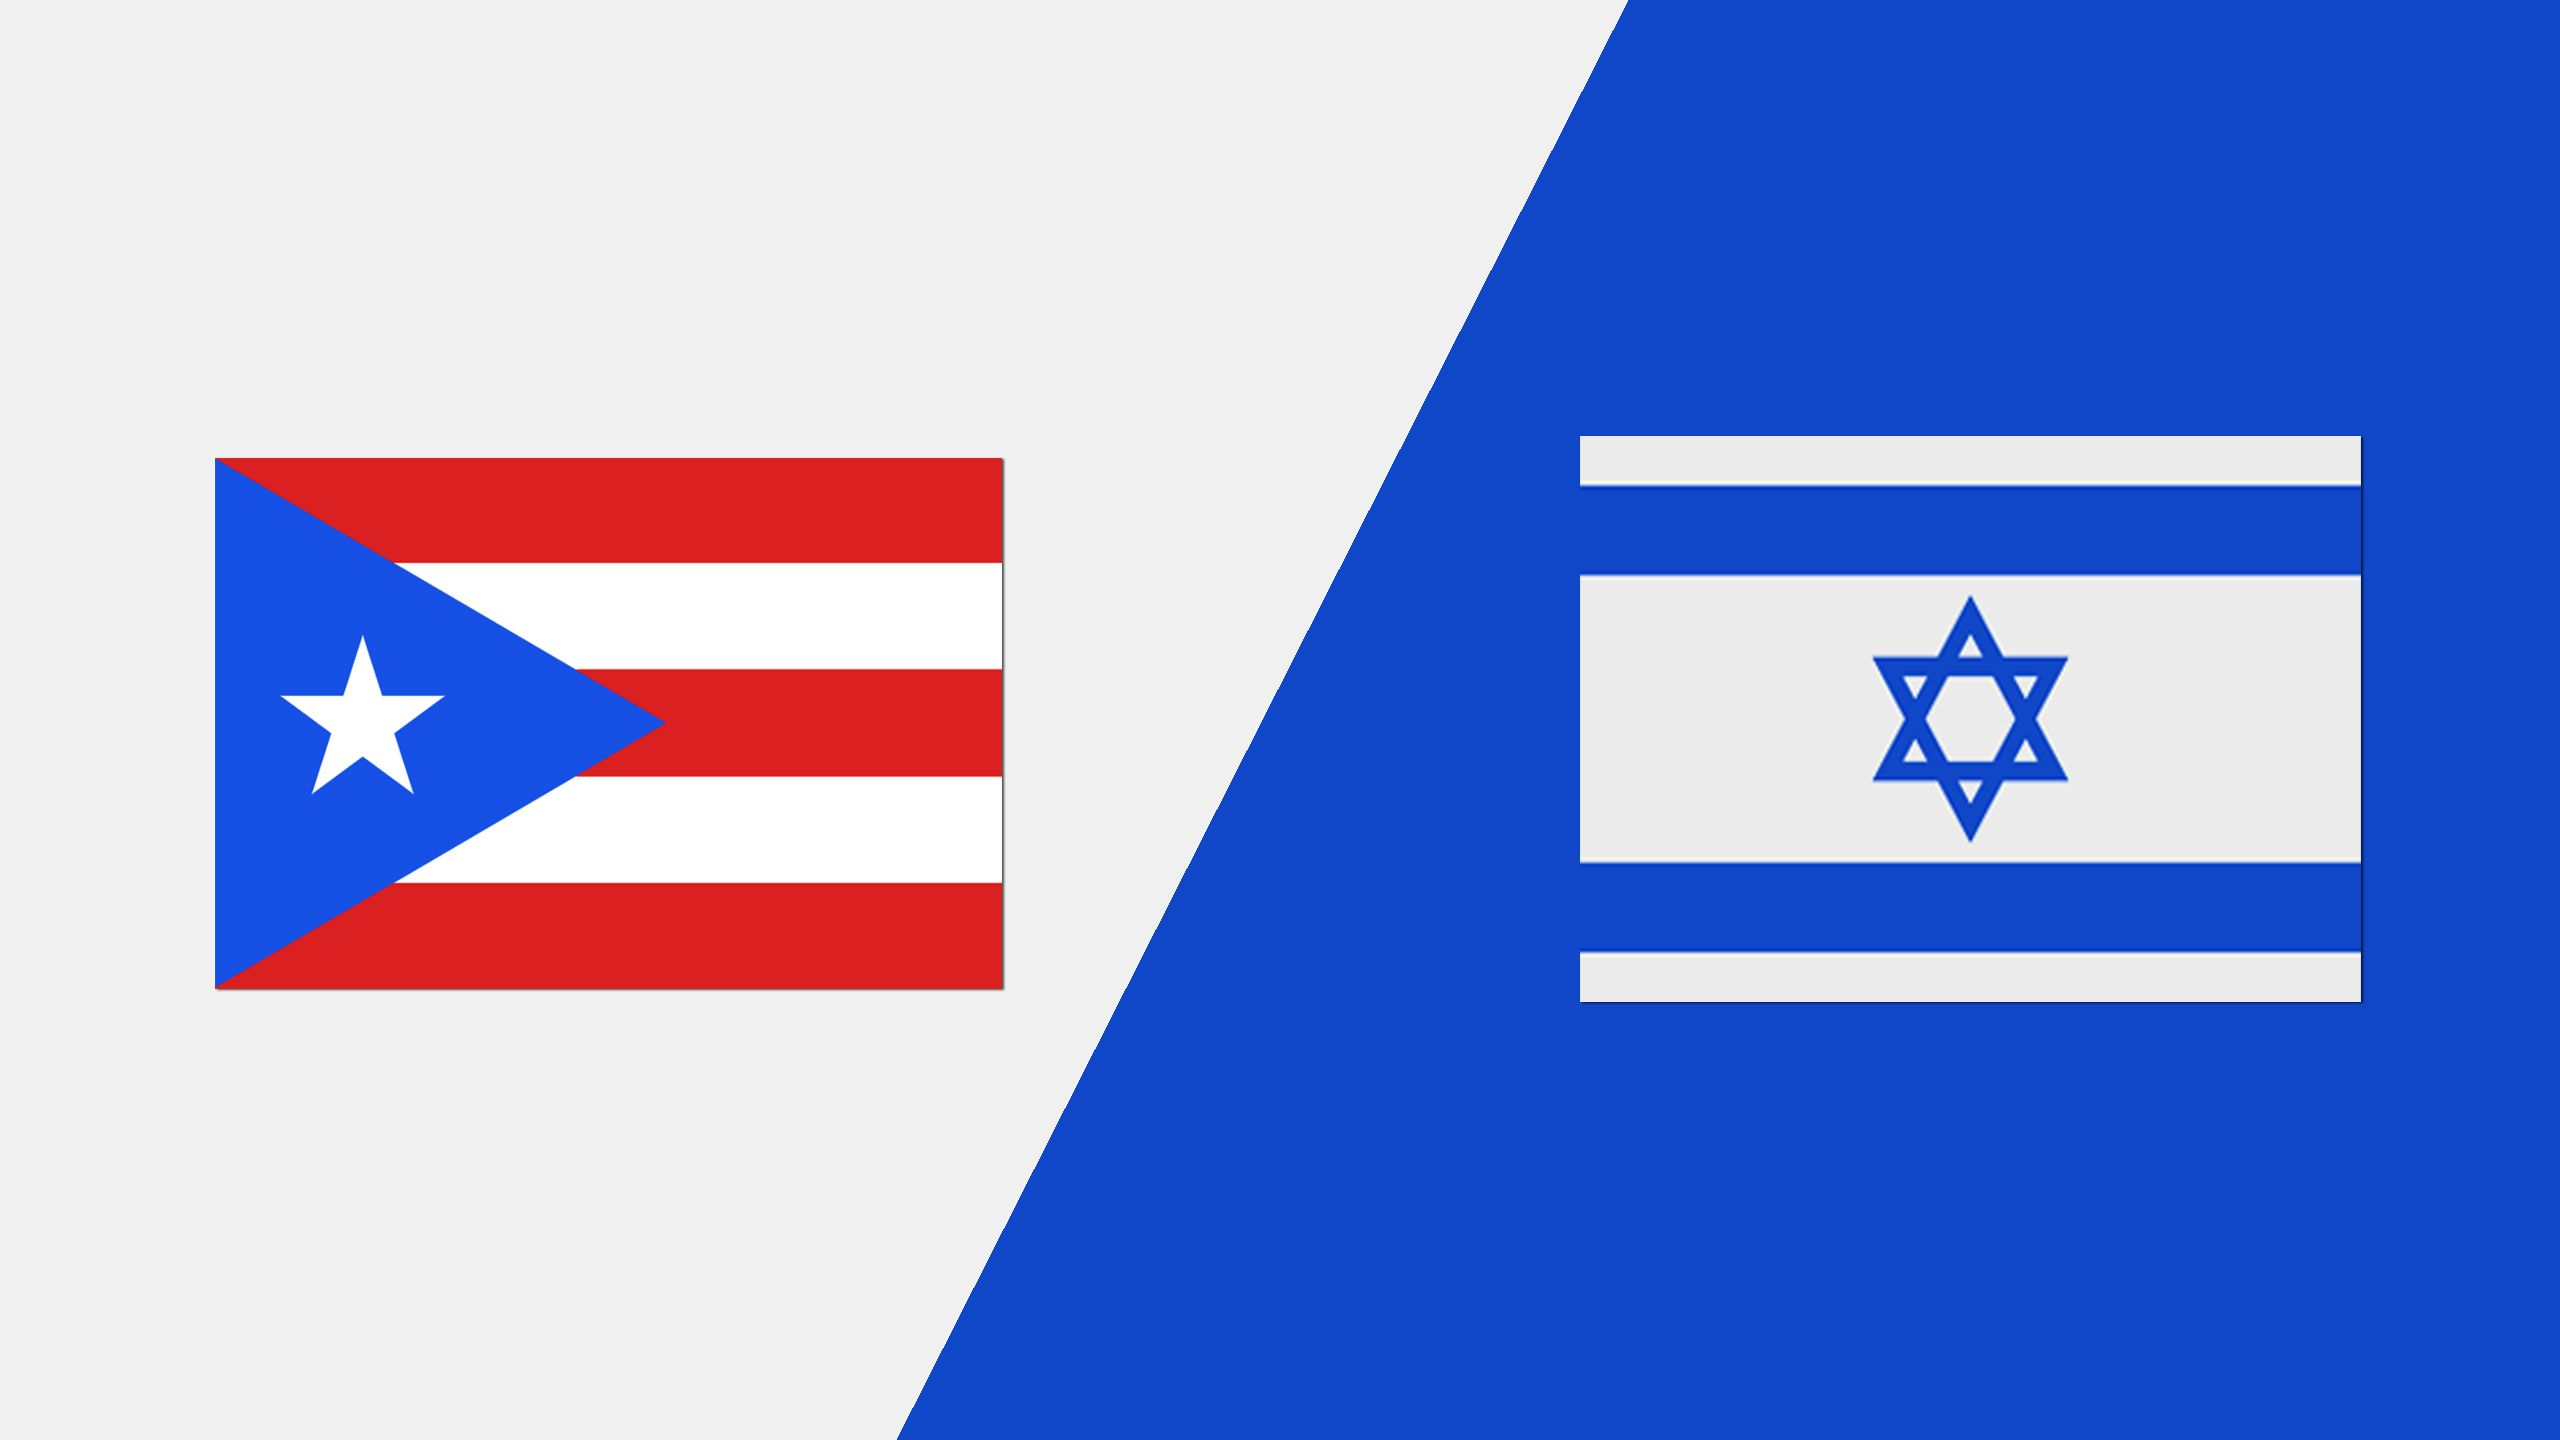 Puerto Rico vs. Israel (2018 FIL World Lacrosse Championships)